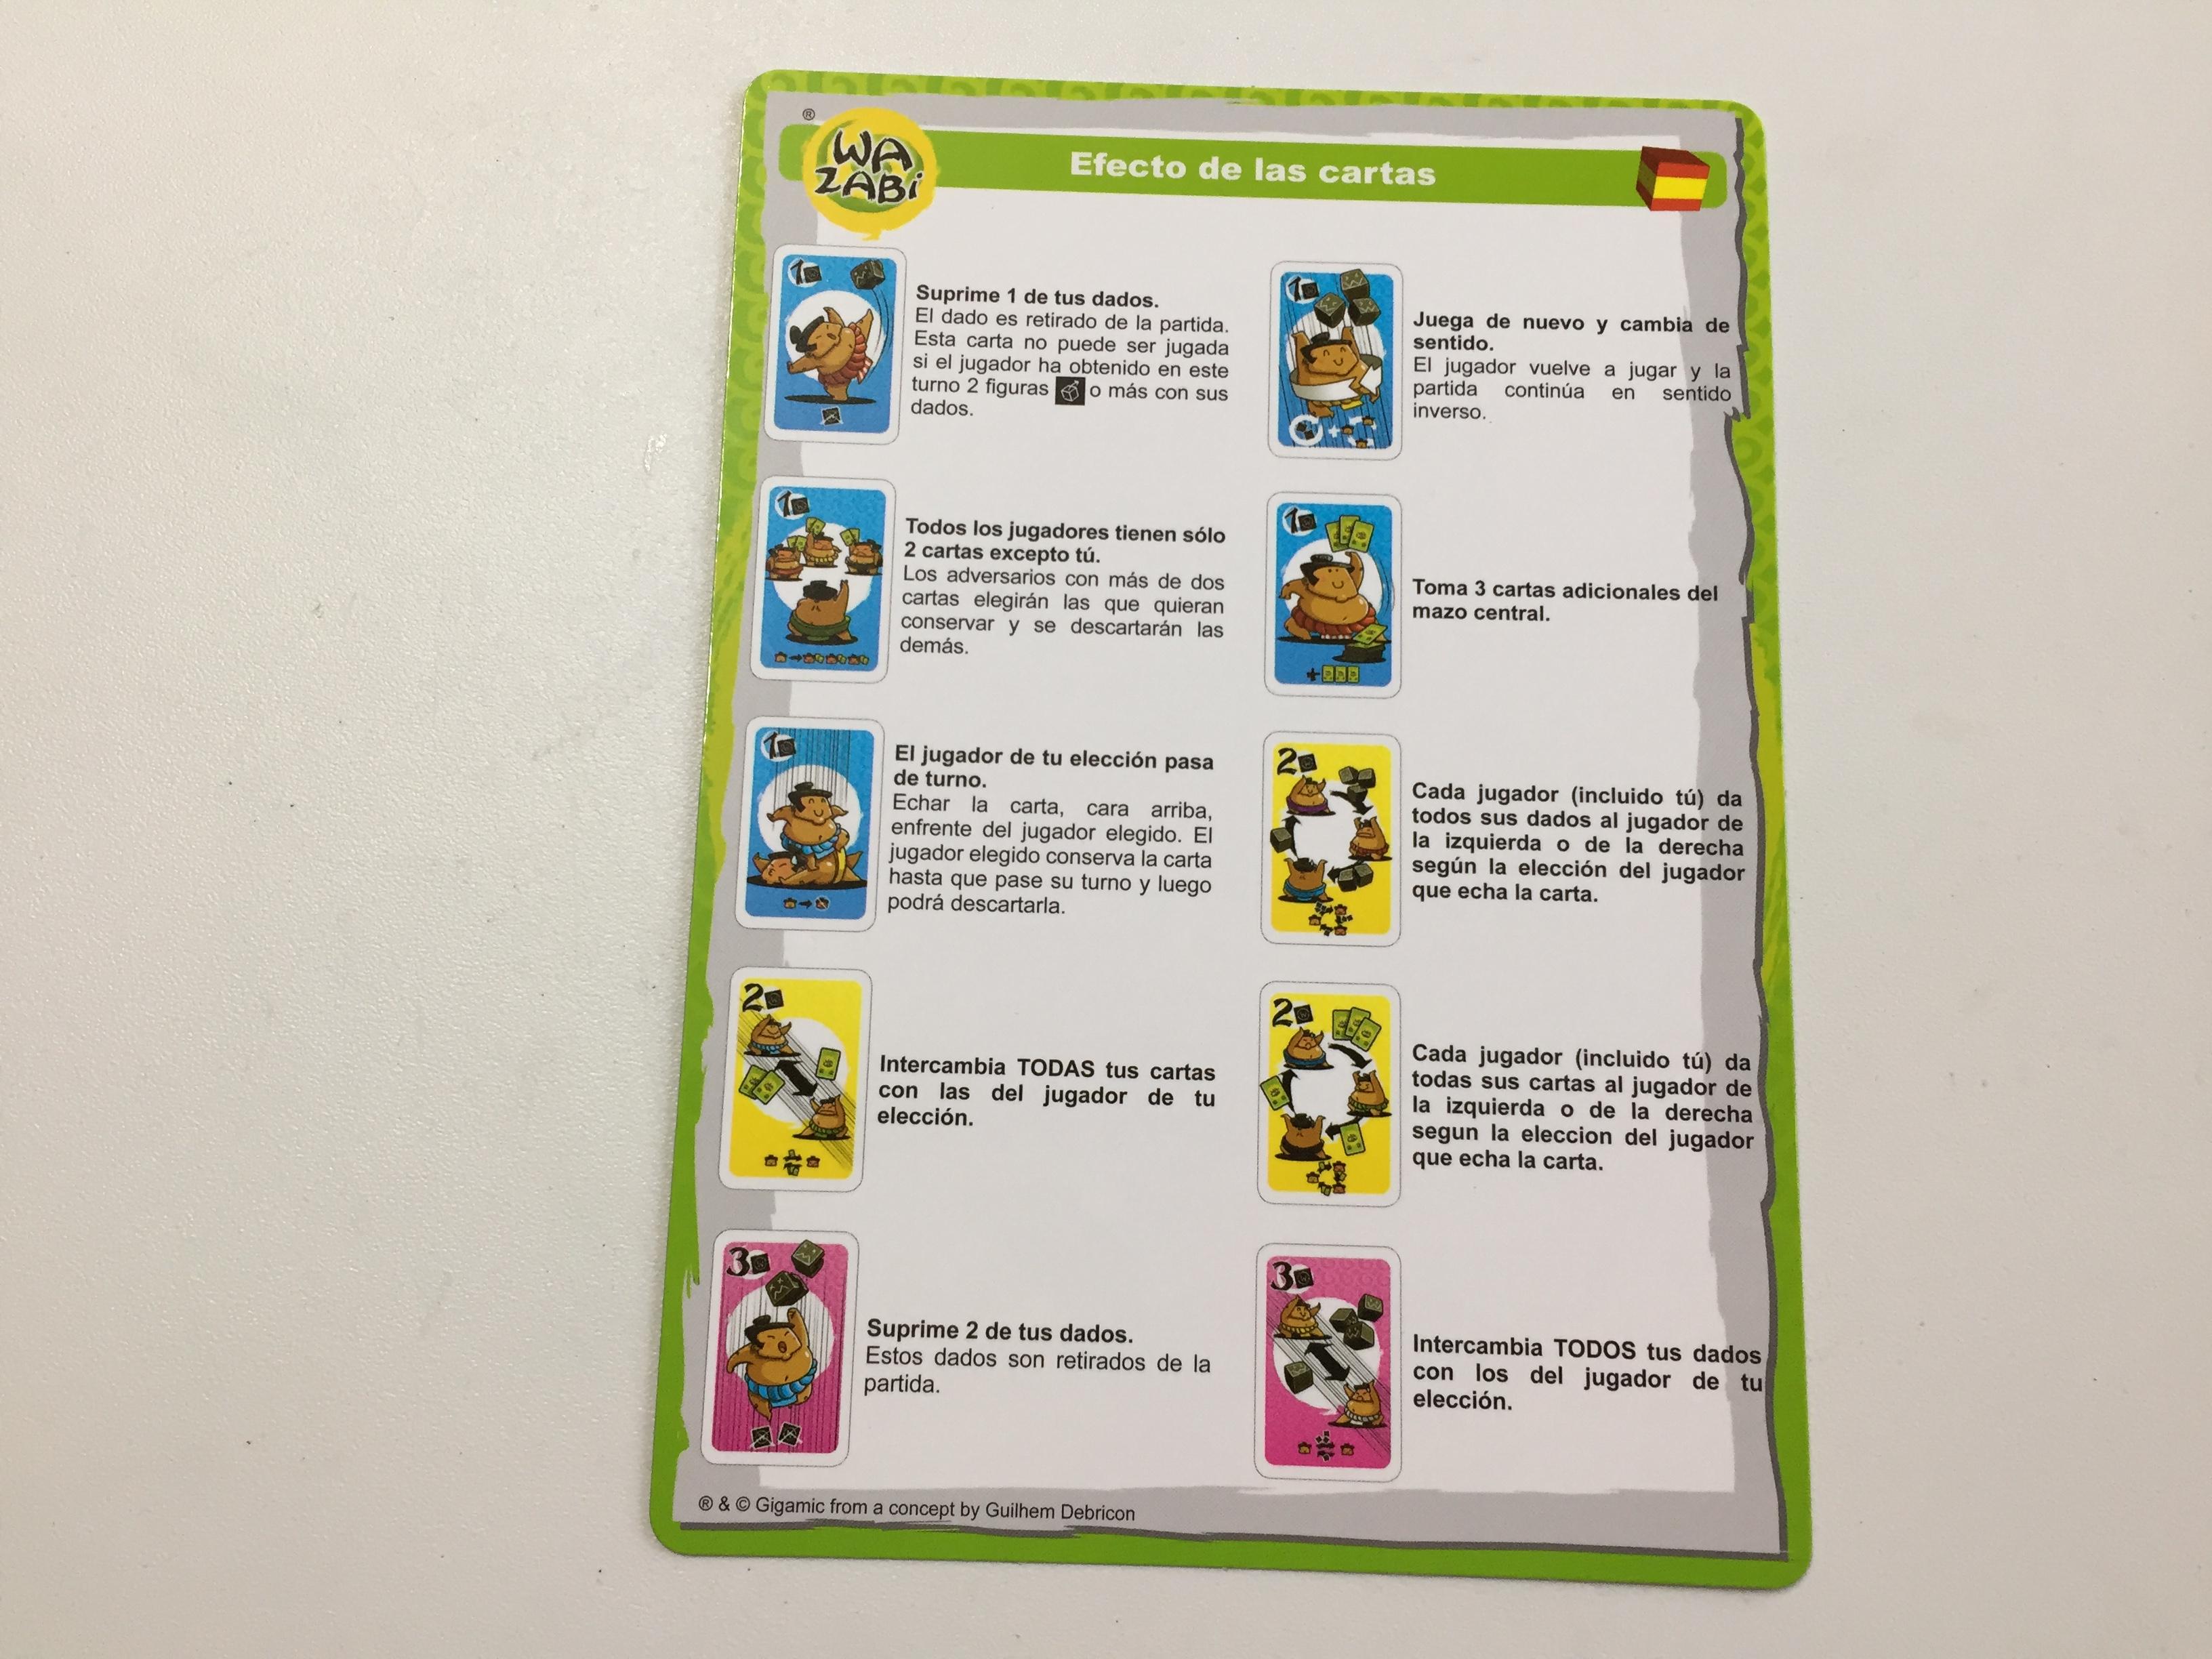 Juegos de Amatic Industries bingo gratis online - 38300